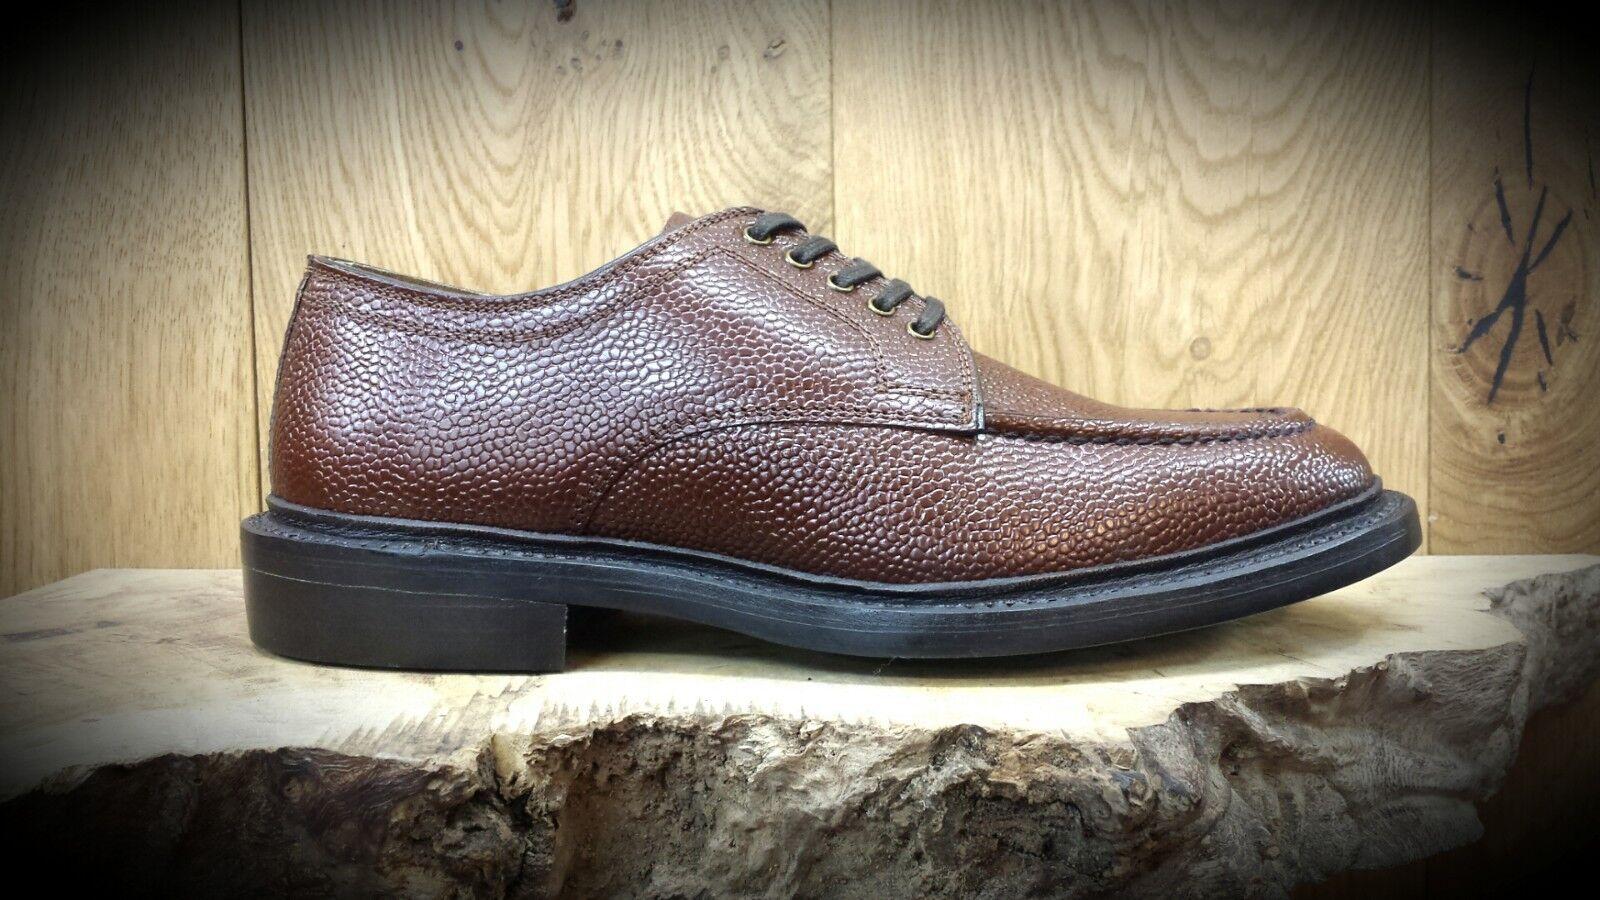 G. H. Bass & Co Monogramm Handgefertigt Gentlemans Schuhe VERMINDERT